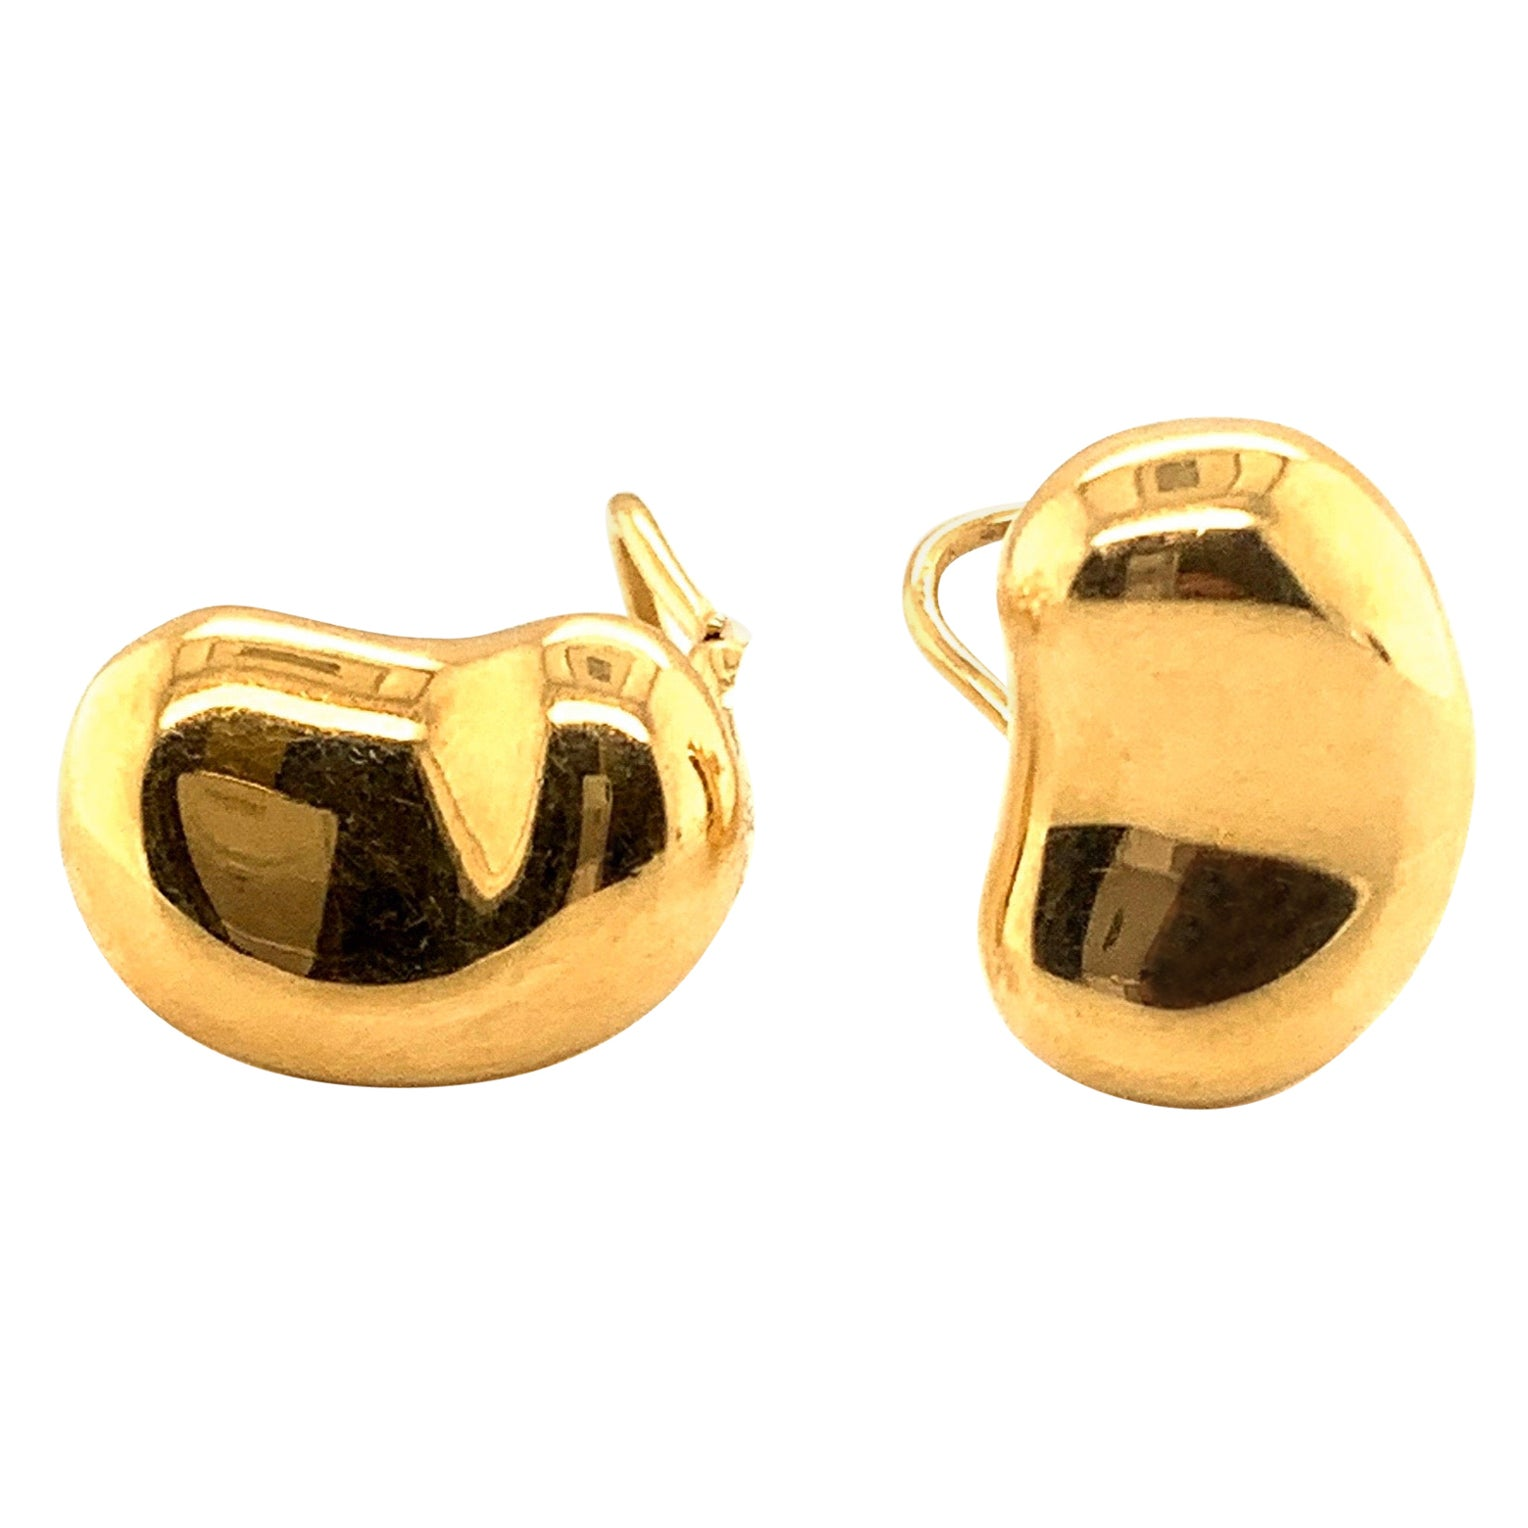 18 Karat Gold Elsa Peretti Tiffany & Co. Bean Necklace